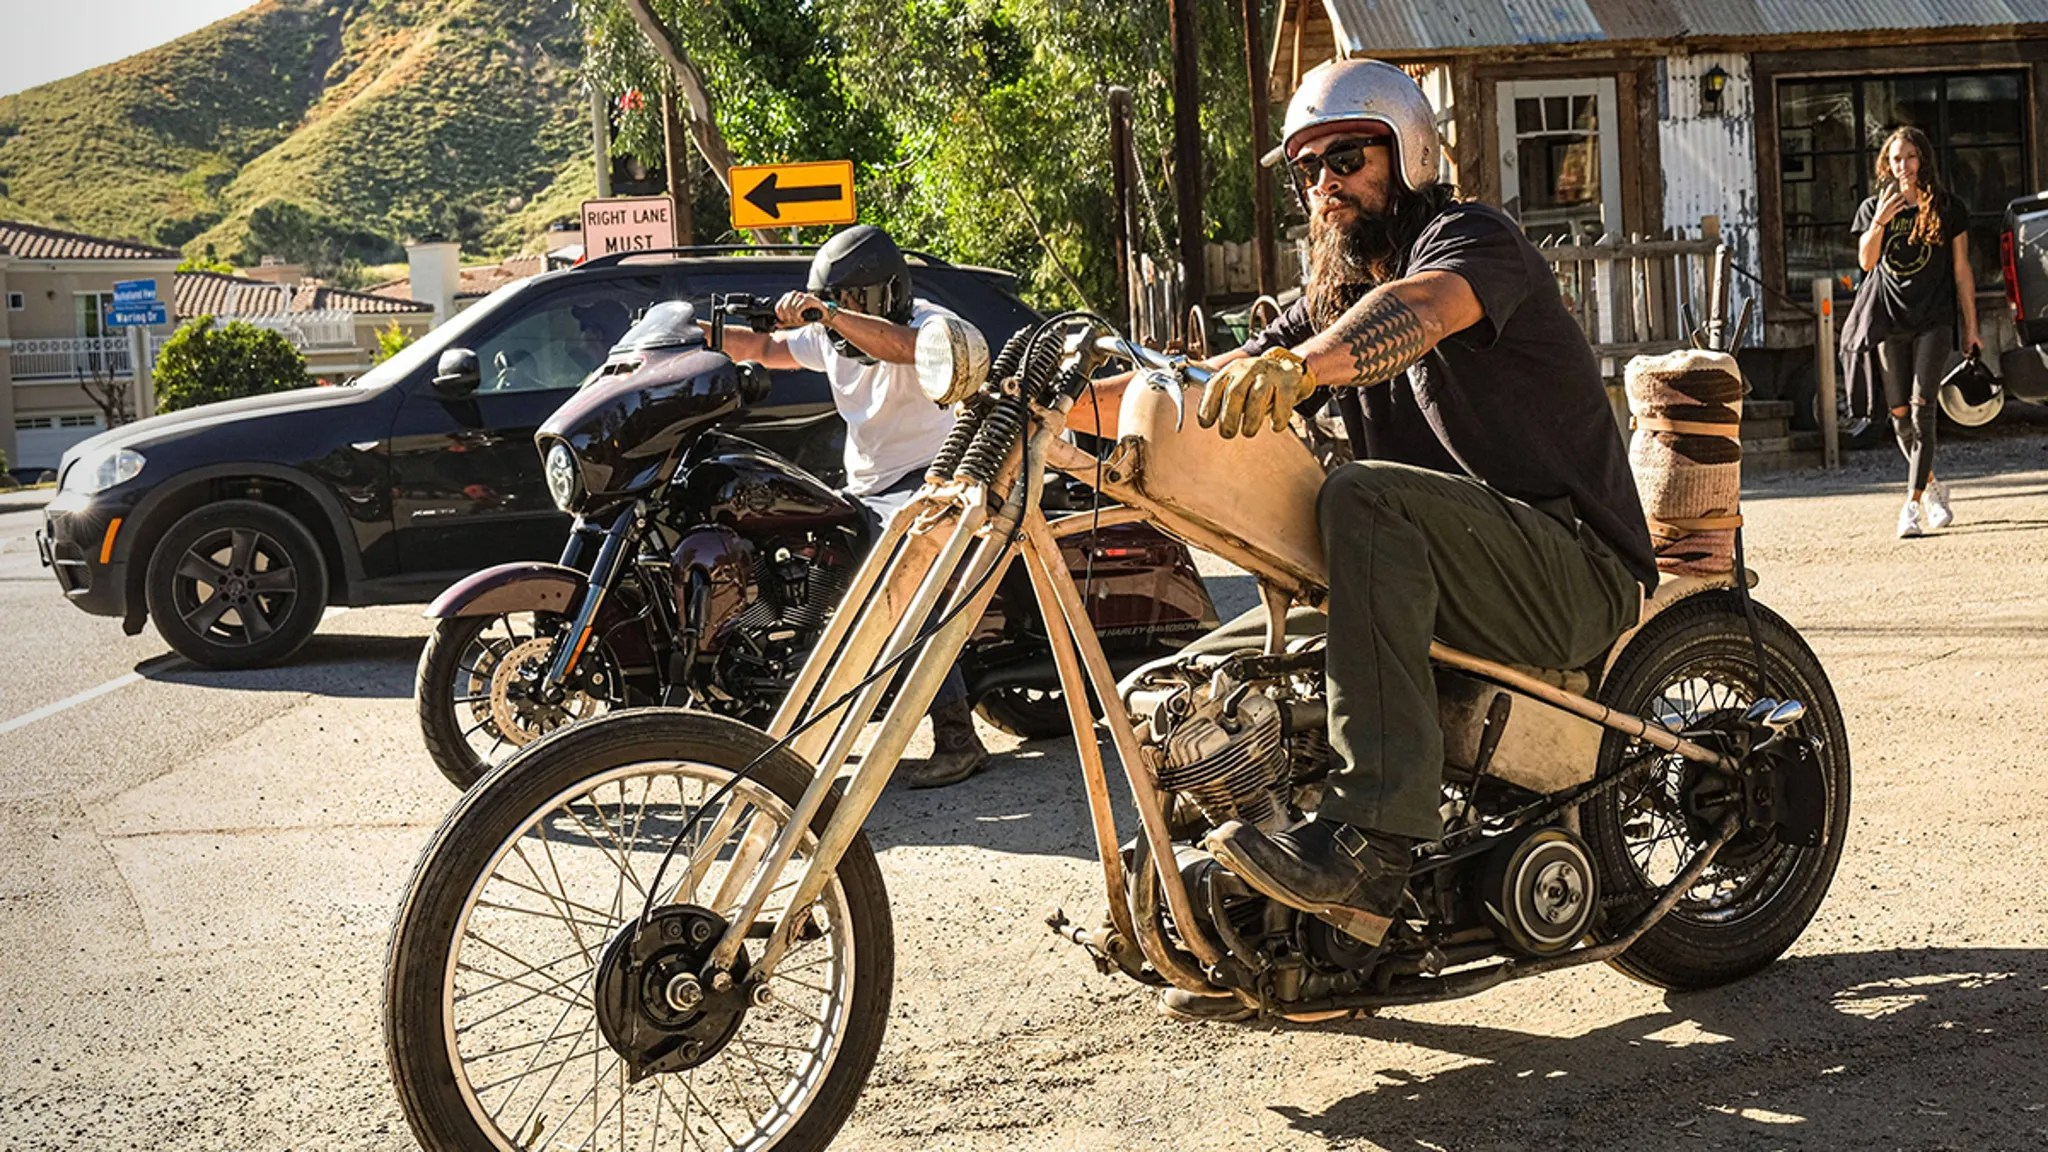 Jason Momoa Takes Quarantine Break with Sweet Harley Ride